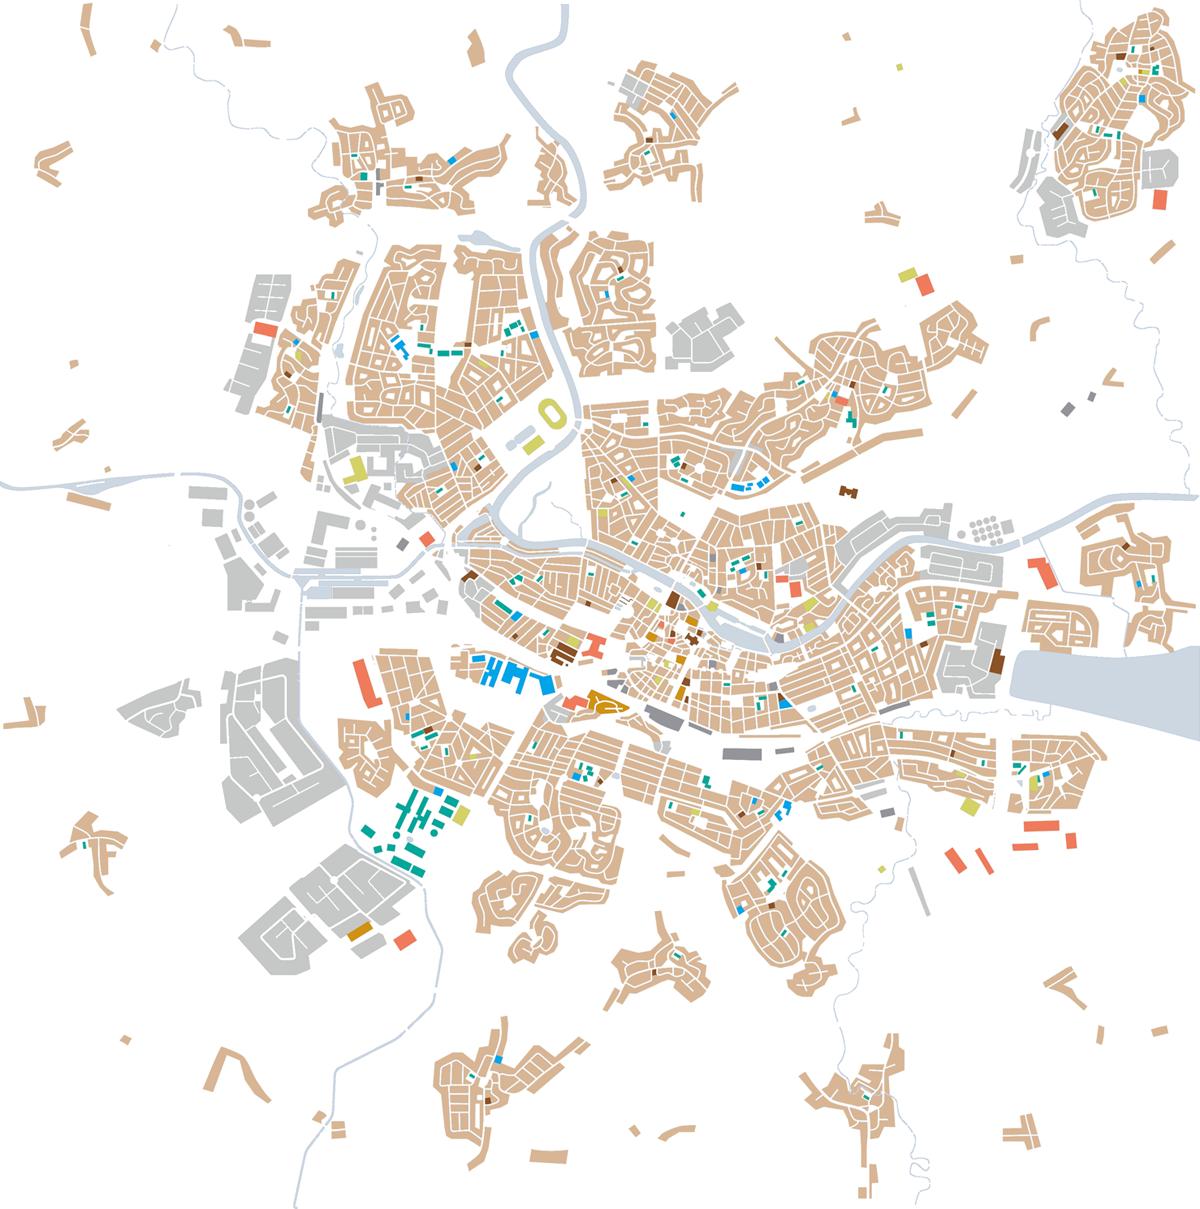 Pinscher cmap - urban areas